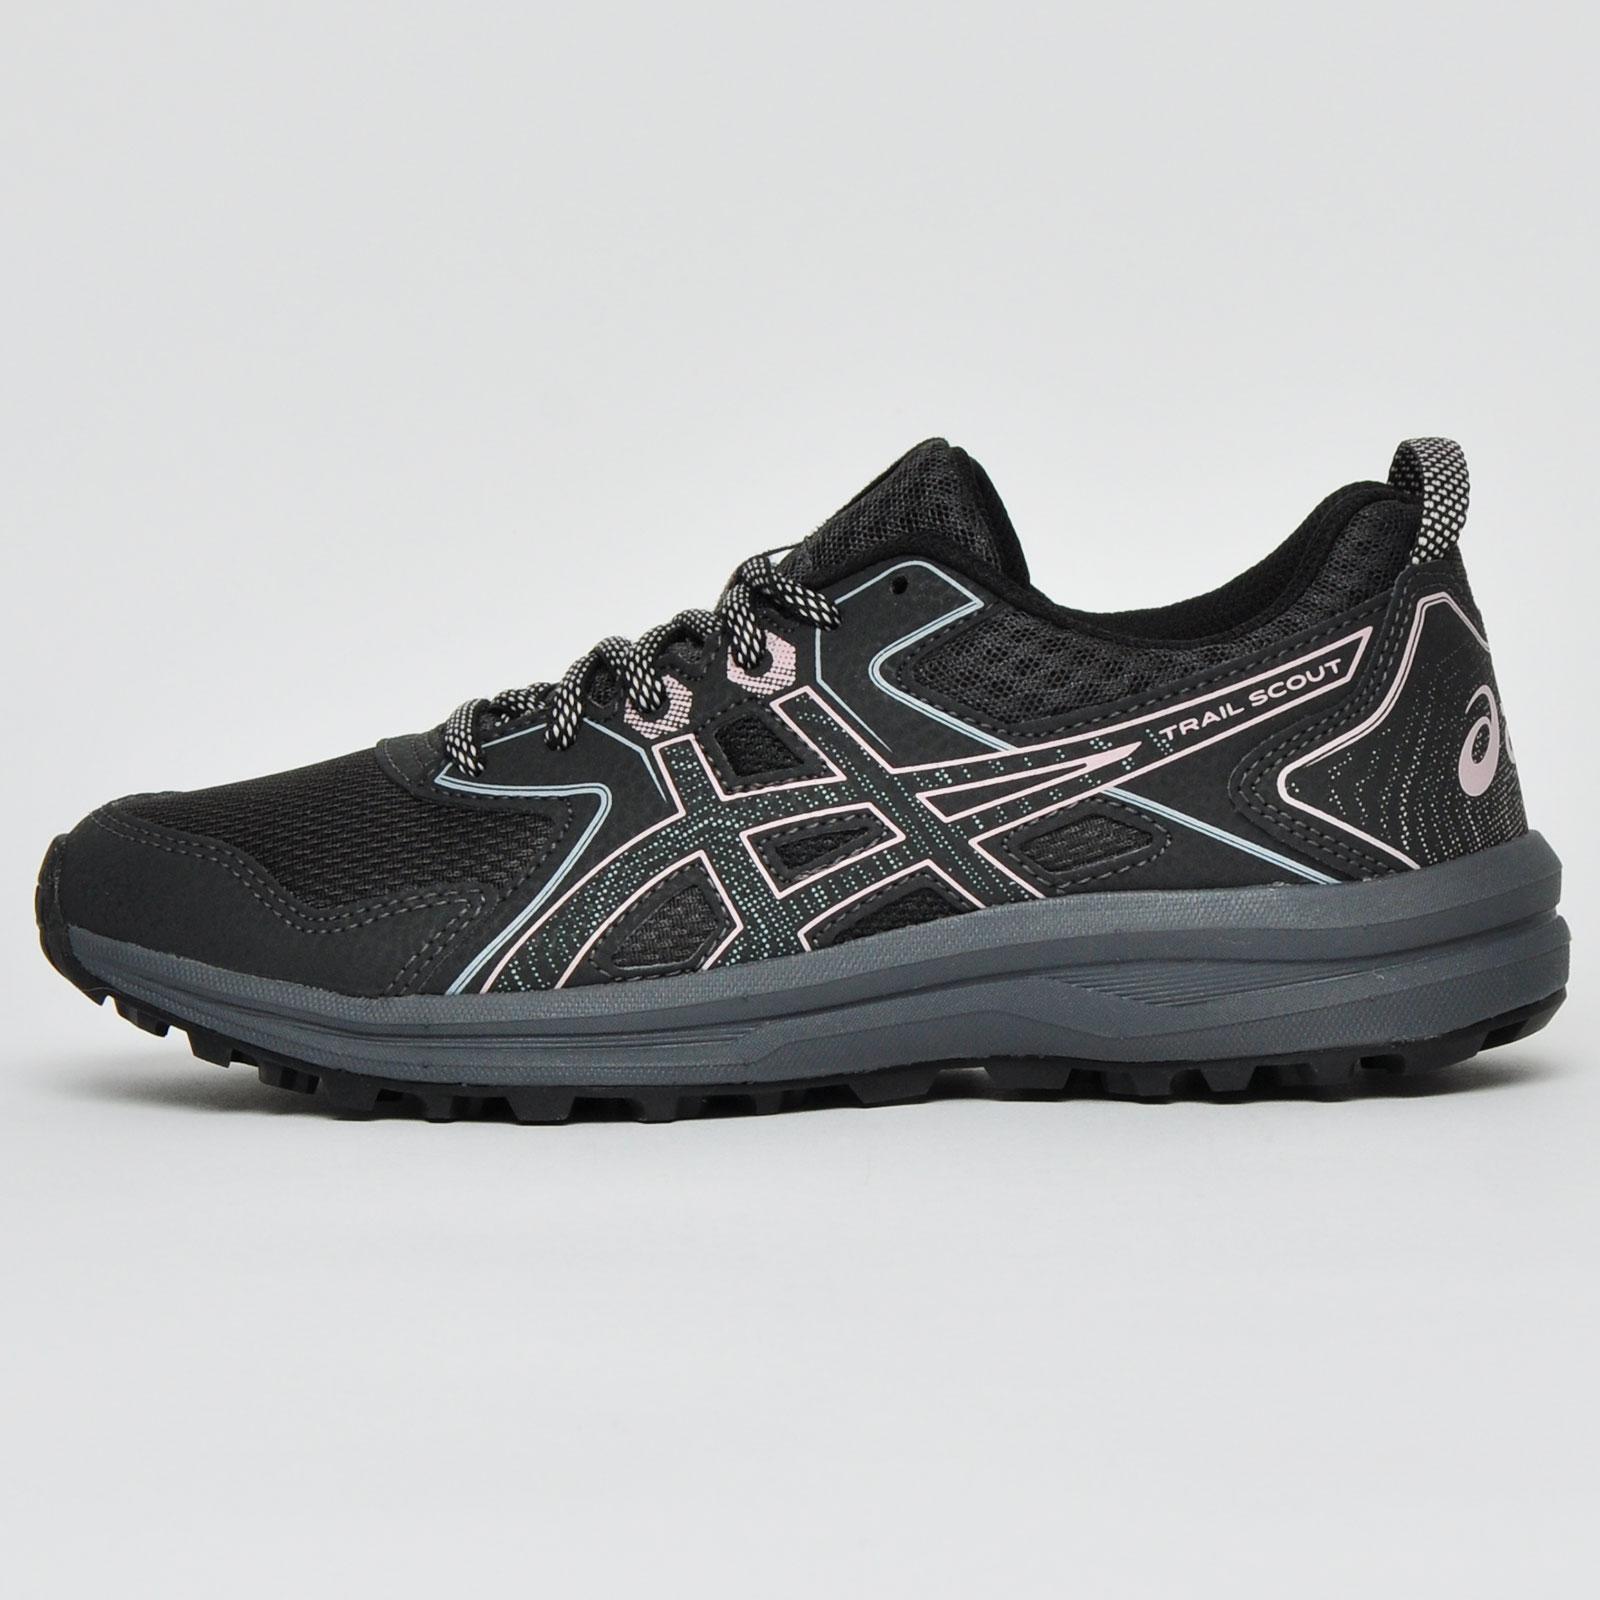 Terrain Trail Running Shoes Grey